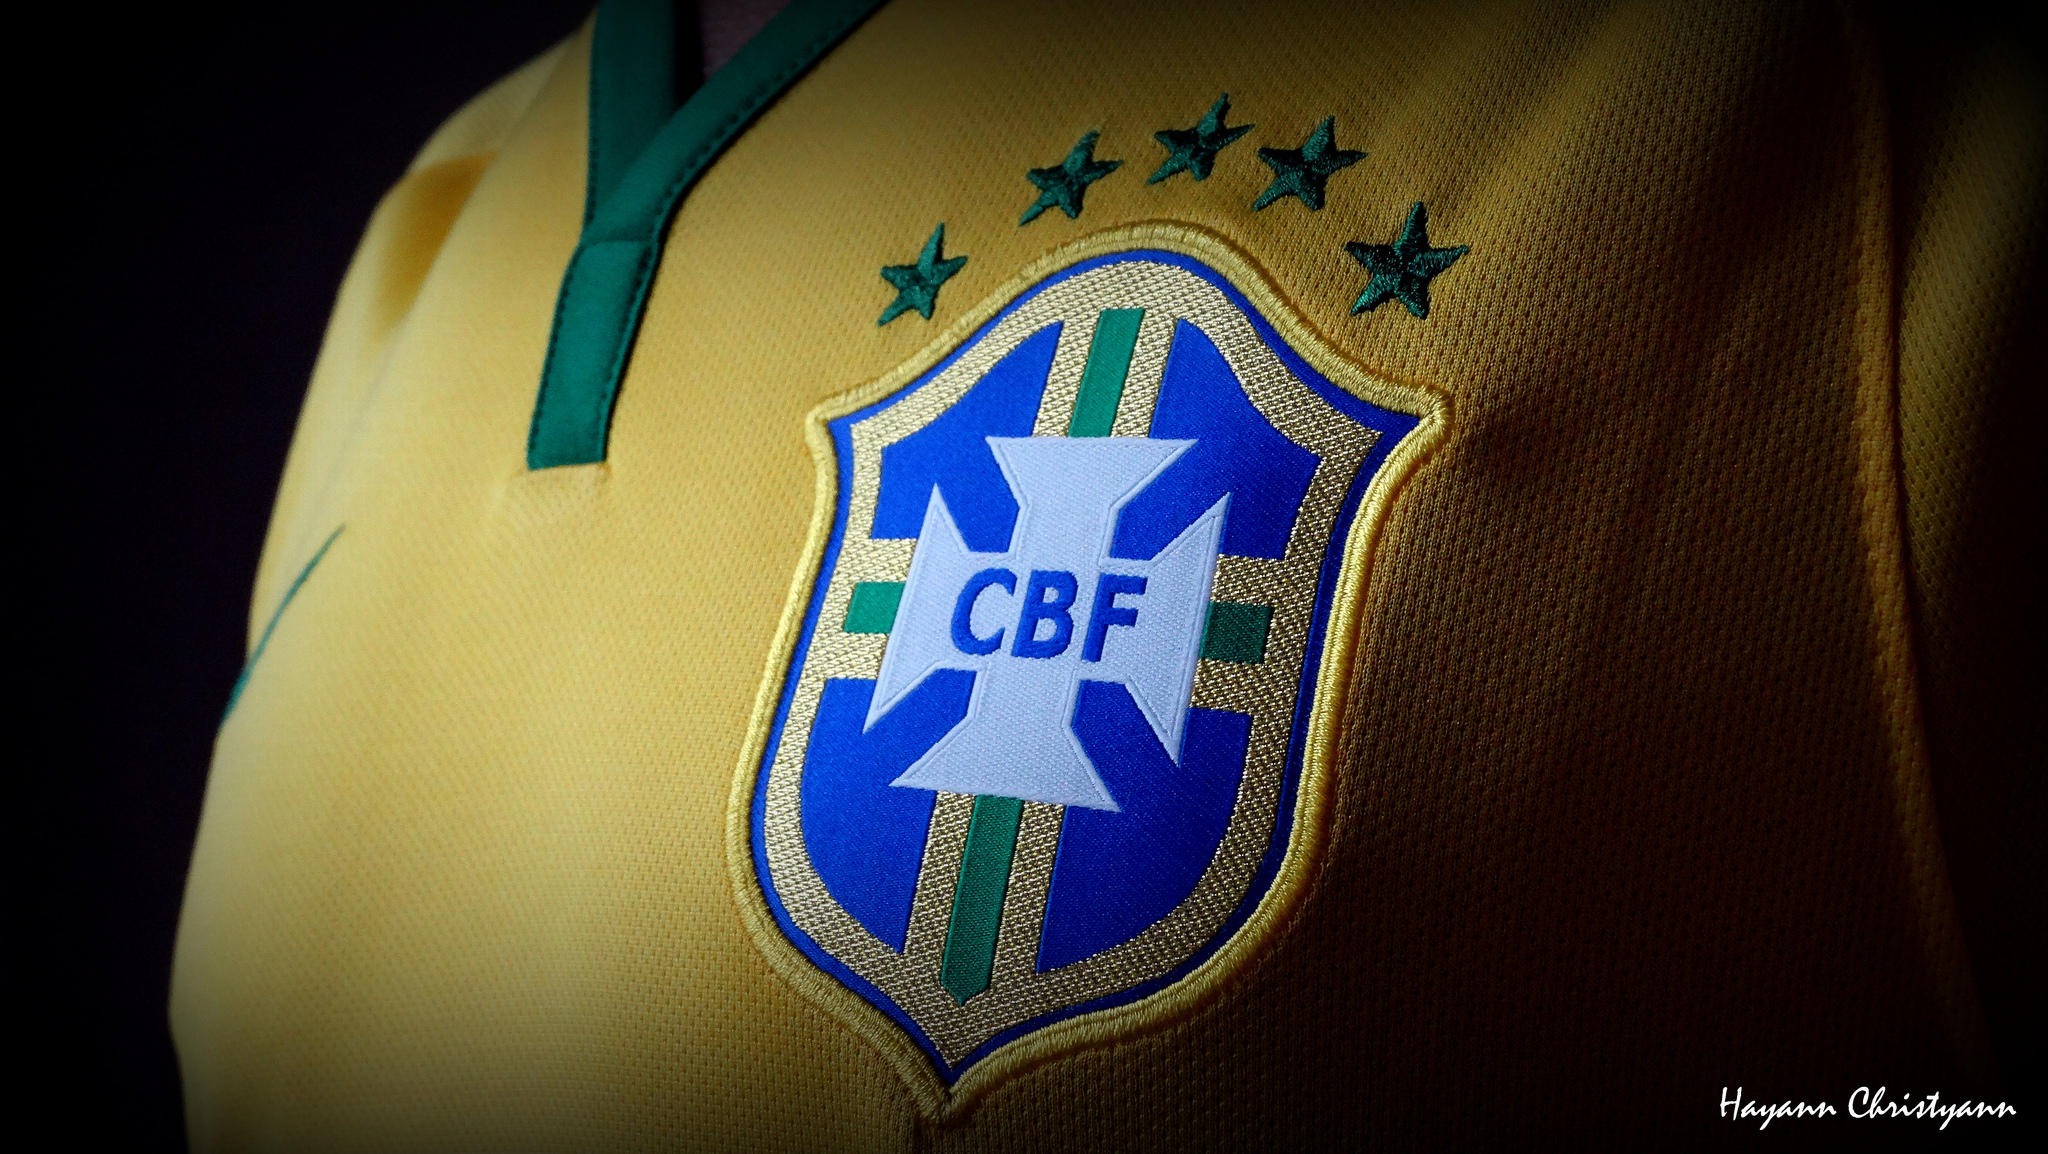 La camiseta de Brasil 2014 - 2048x1154